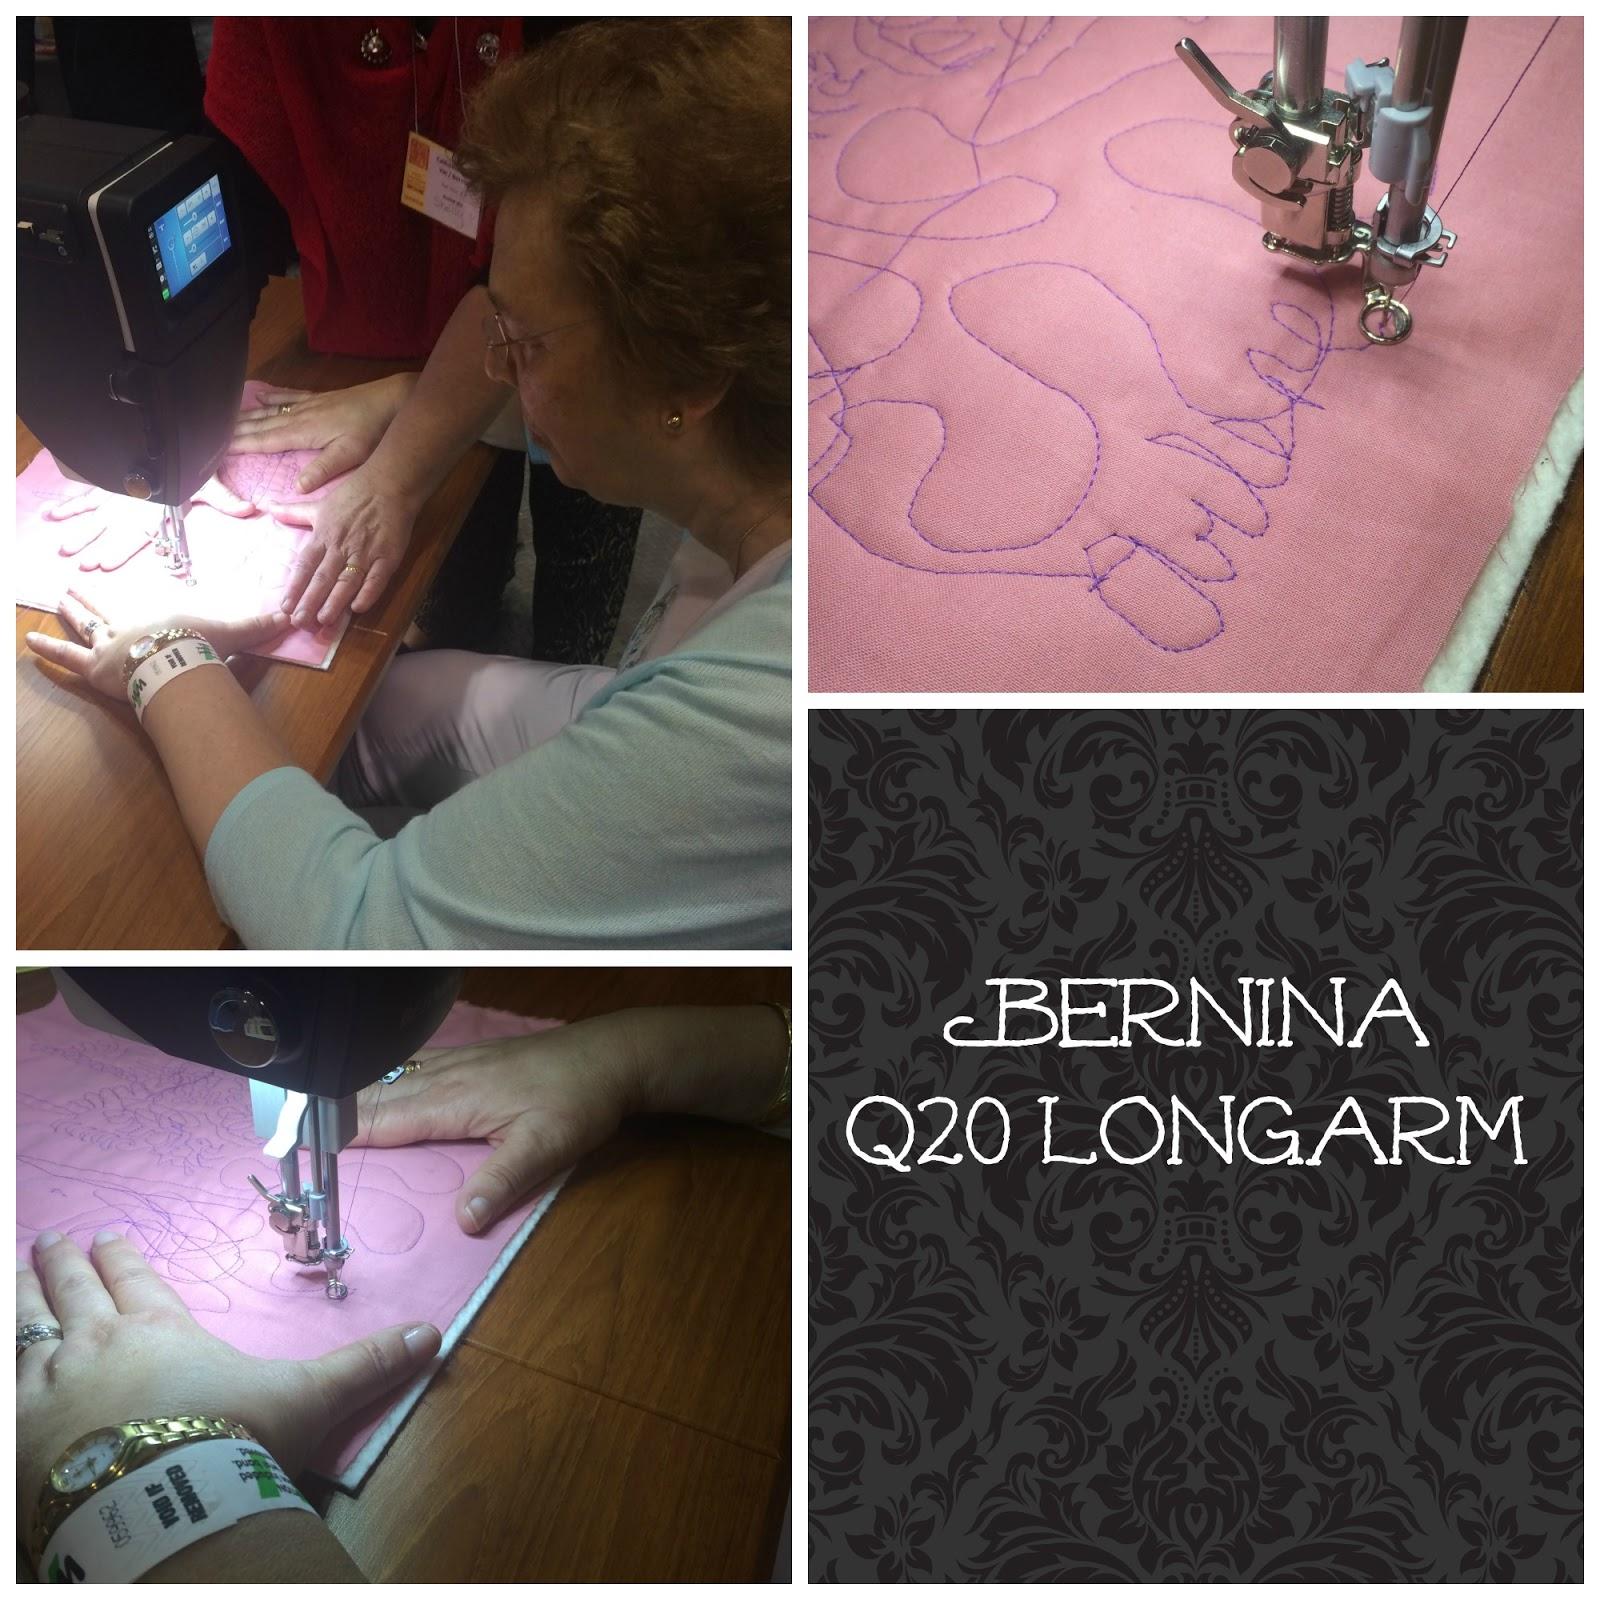 Bernina Q20 Longarm